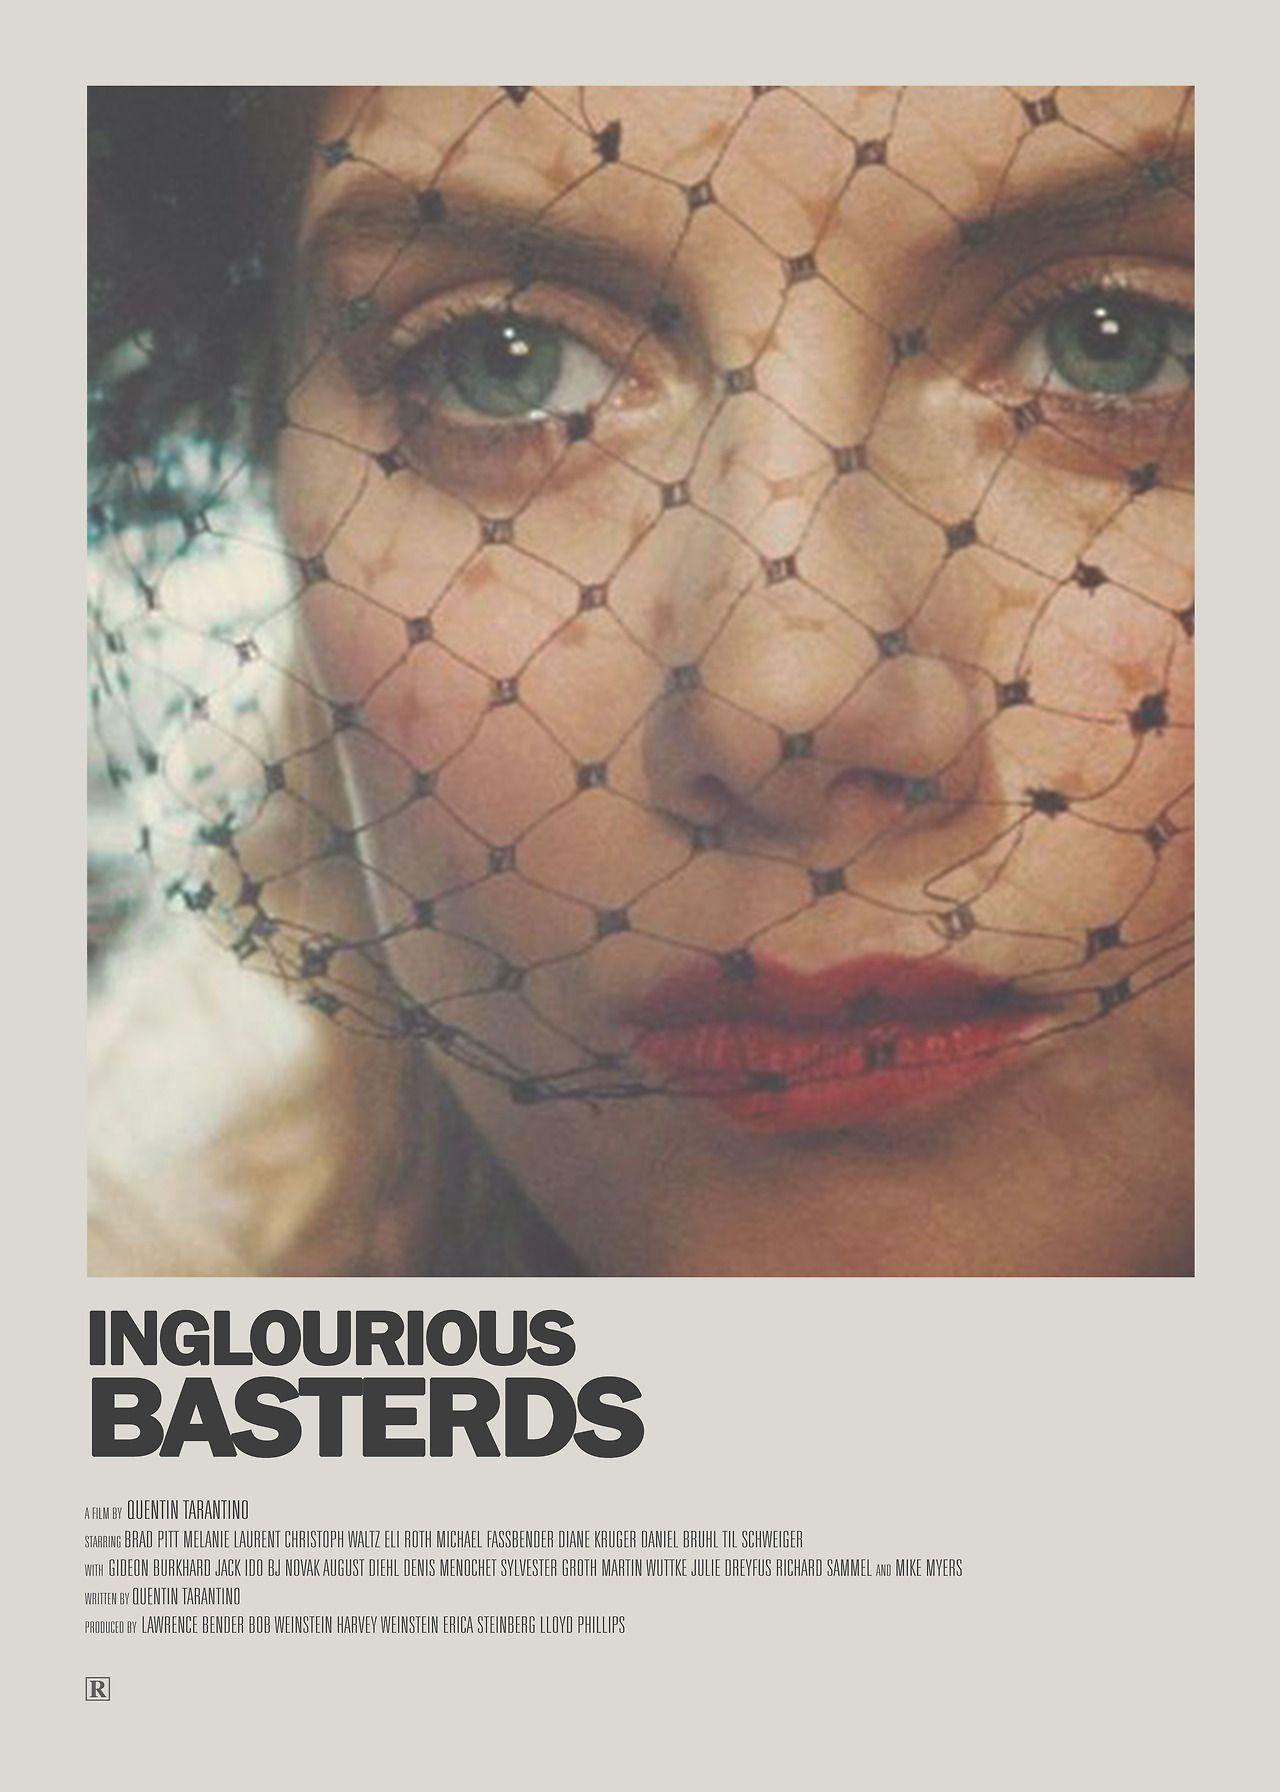 Inglourious Basterds / SHOSANNA / Minimal Movie Poster #filmposters